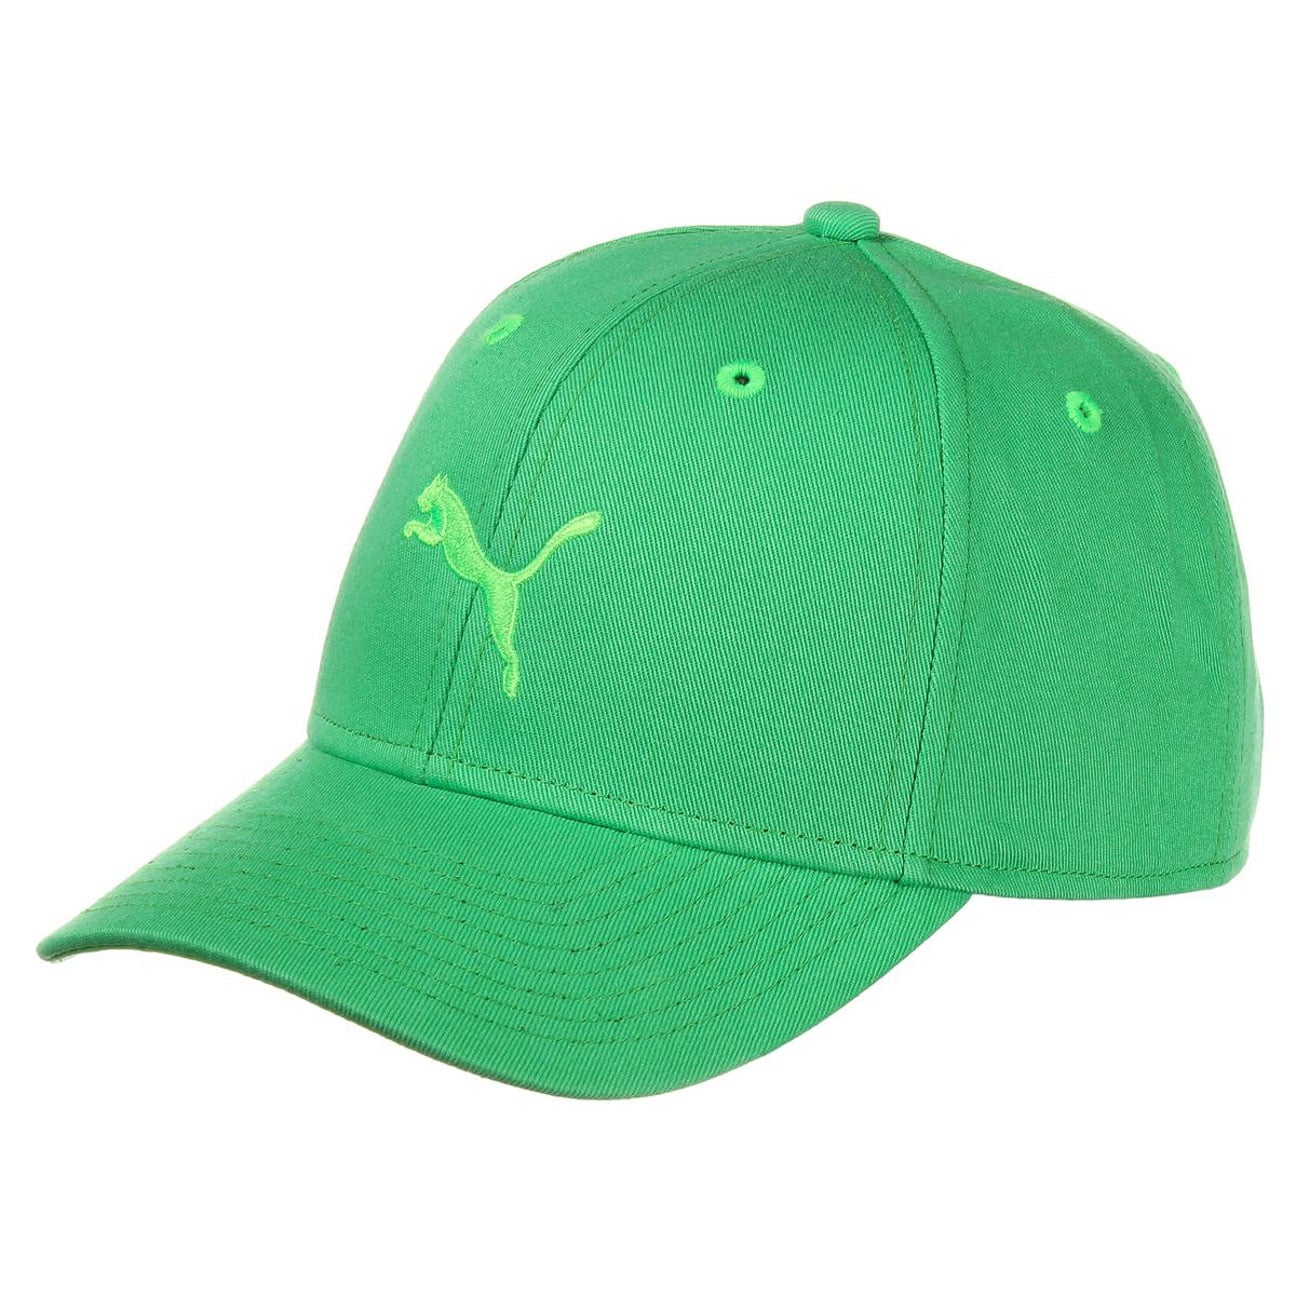 b3dca69c992 ... norway kids jack baseball cap by puma green 1 679a2 d693e